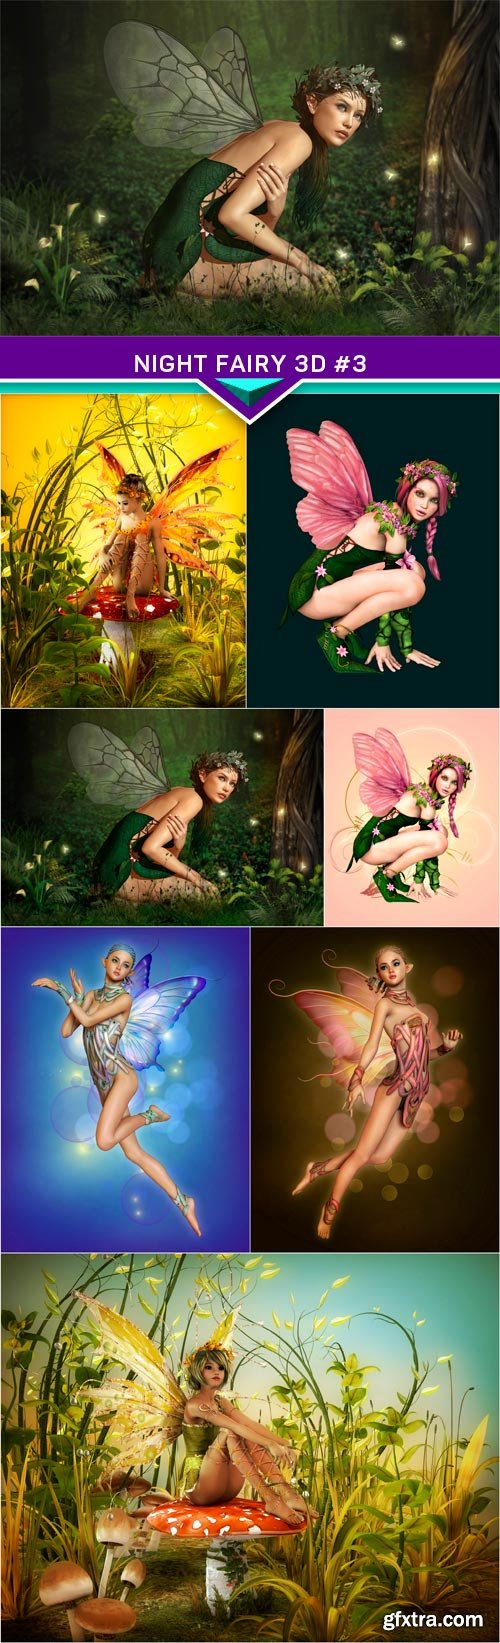 Night Fairy 3d #3 7X JPEG